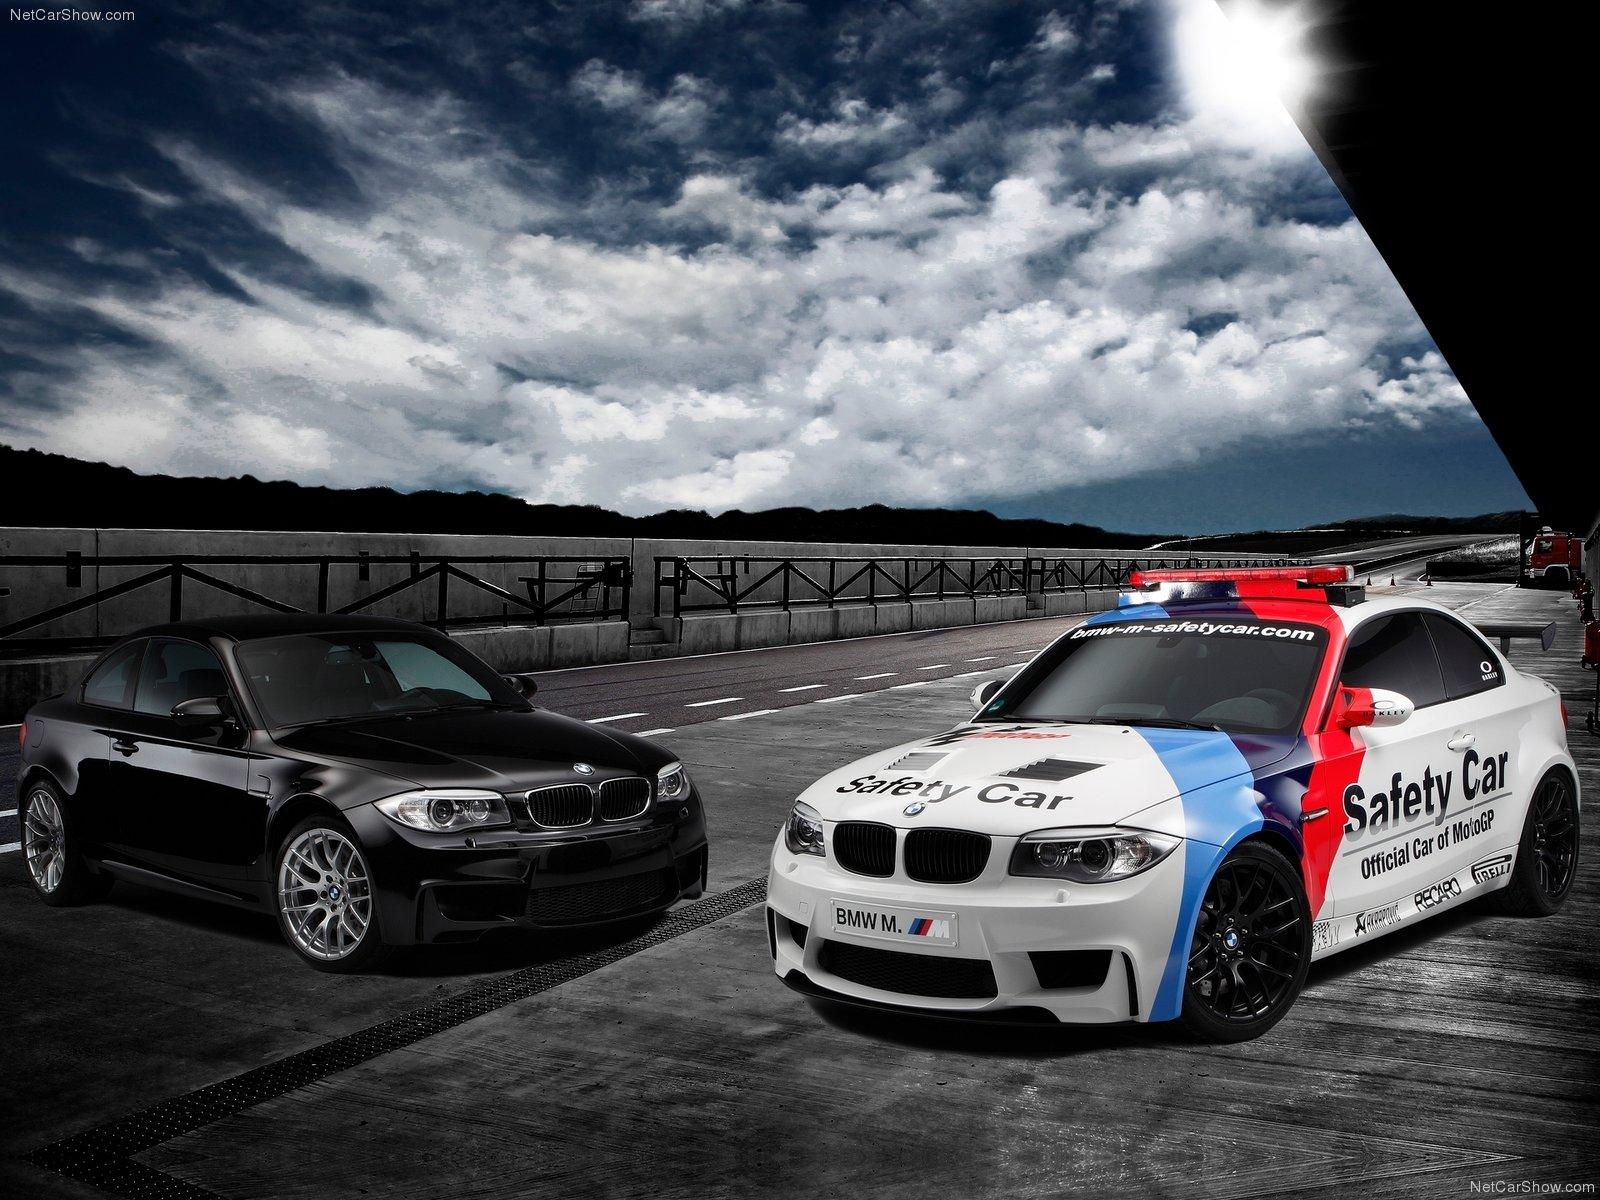 http://2.bp.blogspot.com/-v6ysmuq3xe4/T9ZG32zt0iI/AAAAAAAACCY/7JZZa6RvBd8/s1600/BMW+HQ+Wallpaper+(47).jpg